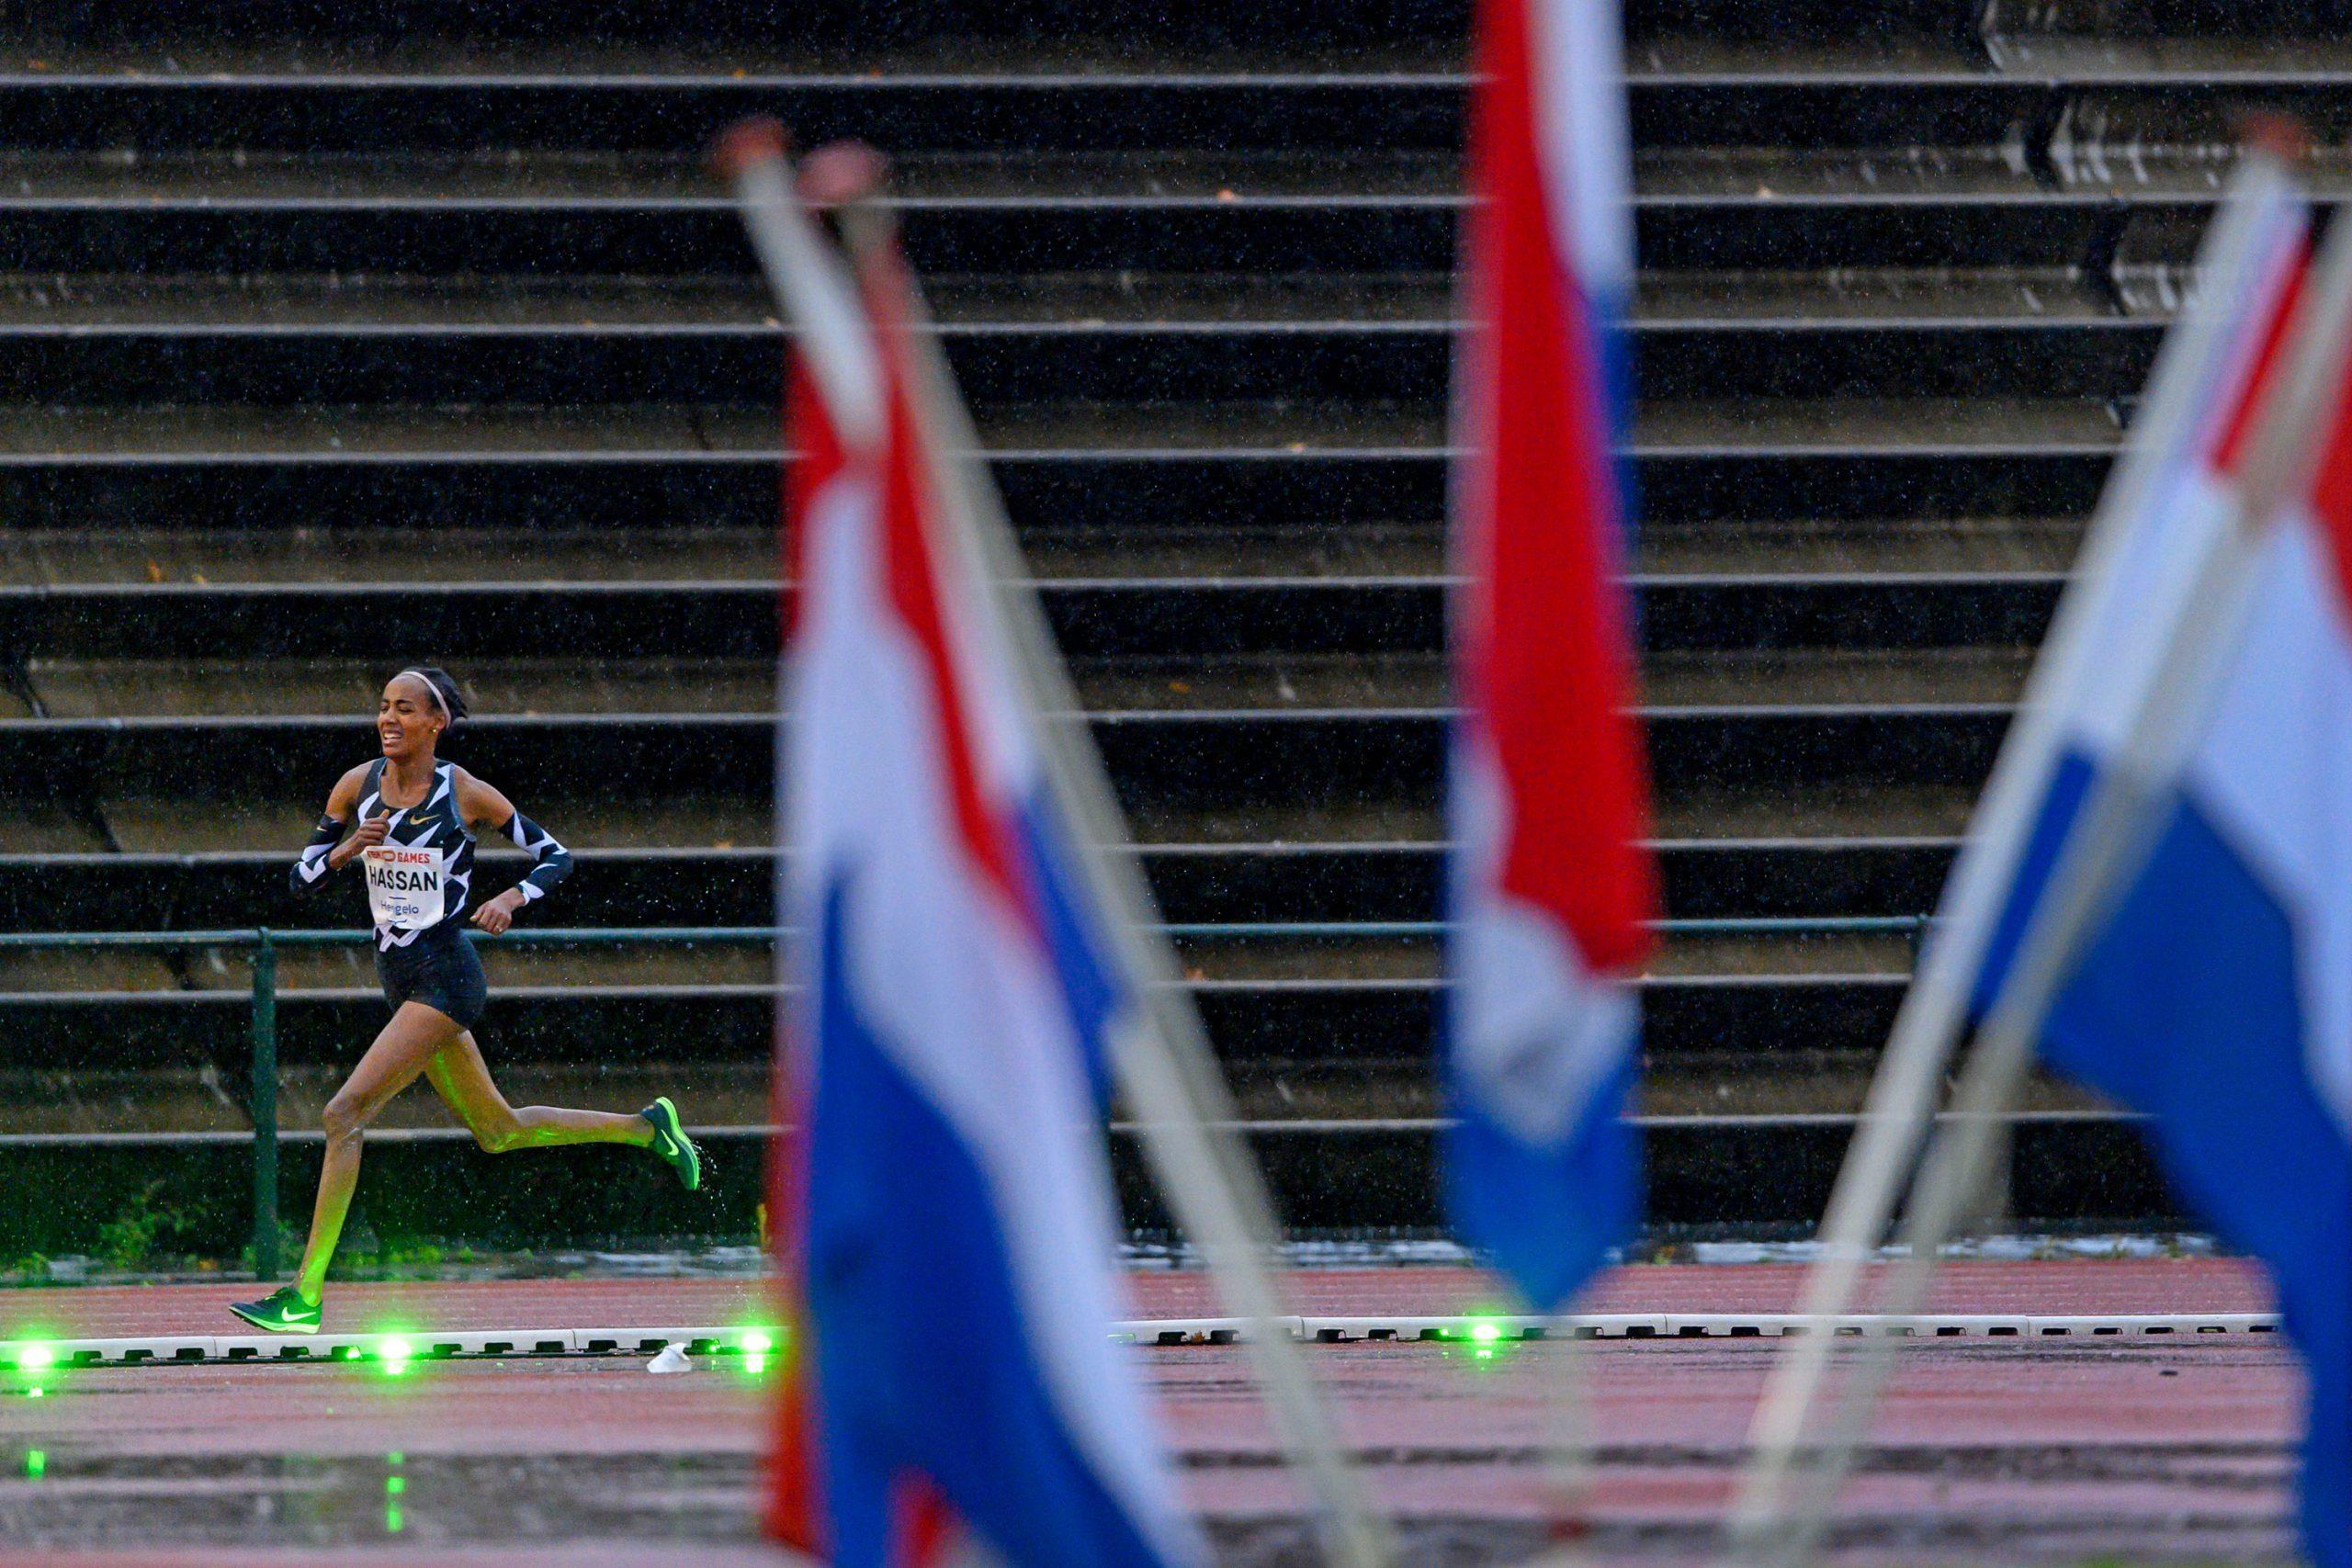 2-13882-Sport-s-Olaf-Kraak-Sifan-Hassan-doet-recordpoging-op-de-FBK-Games-005-scaled